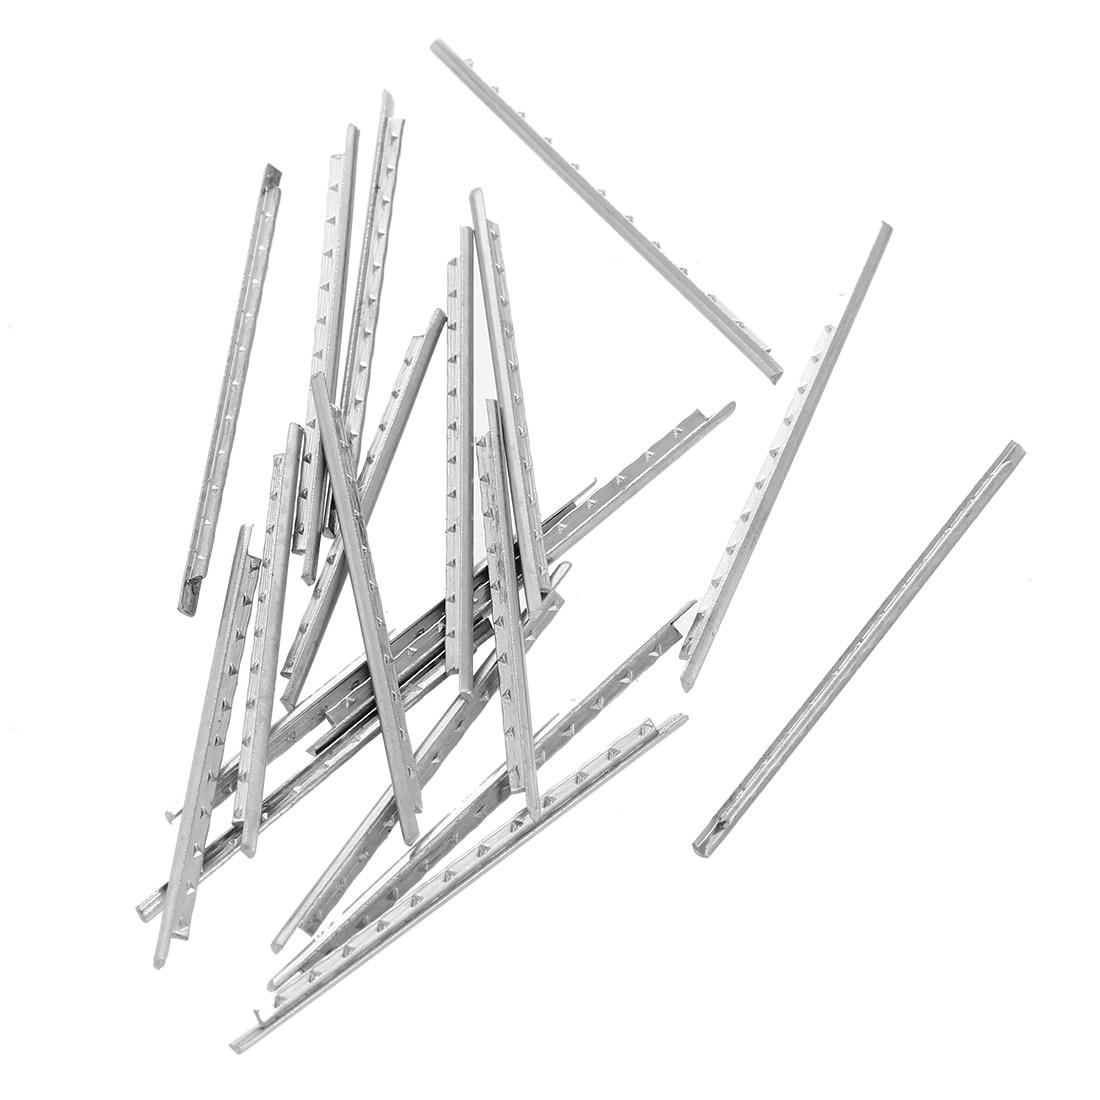 19pcs Fret Wire Copper Fretwire Set 1 7mm For 26 Ukulele